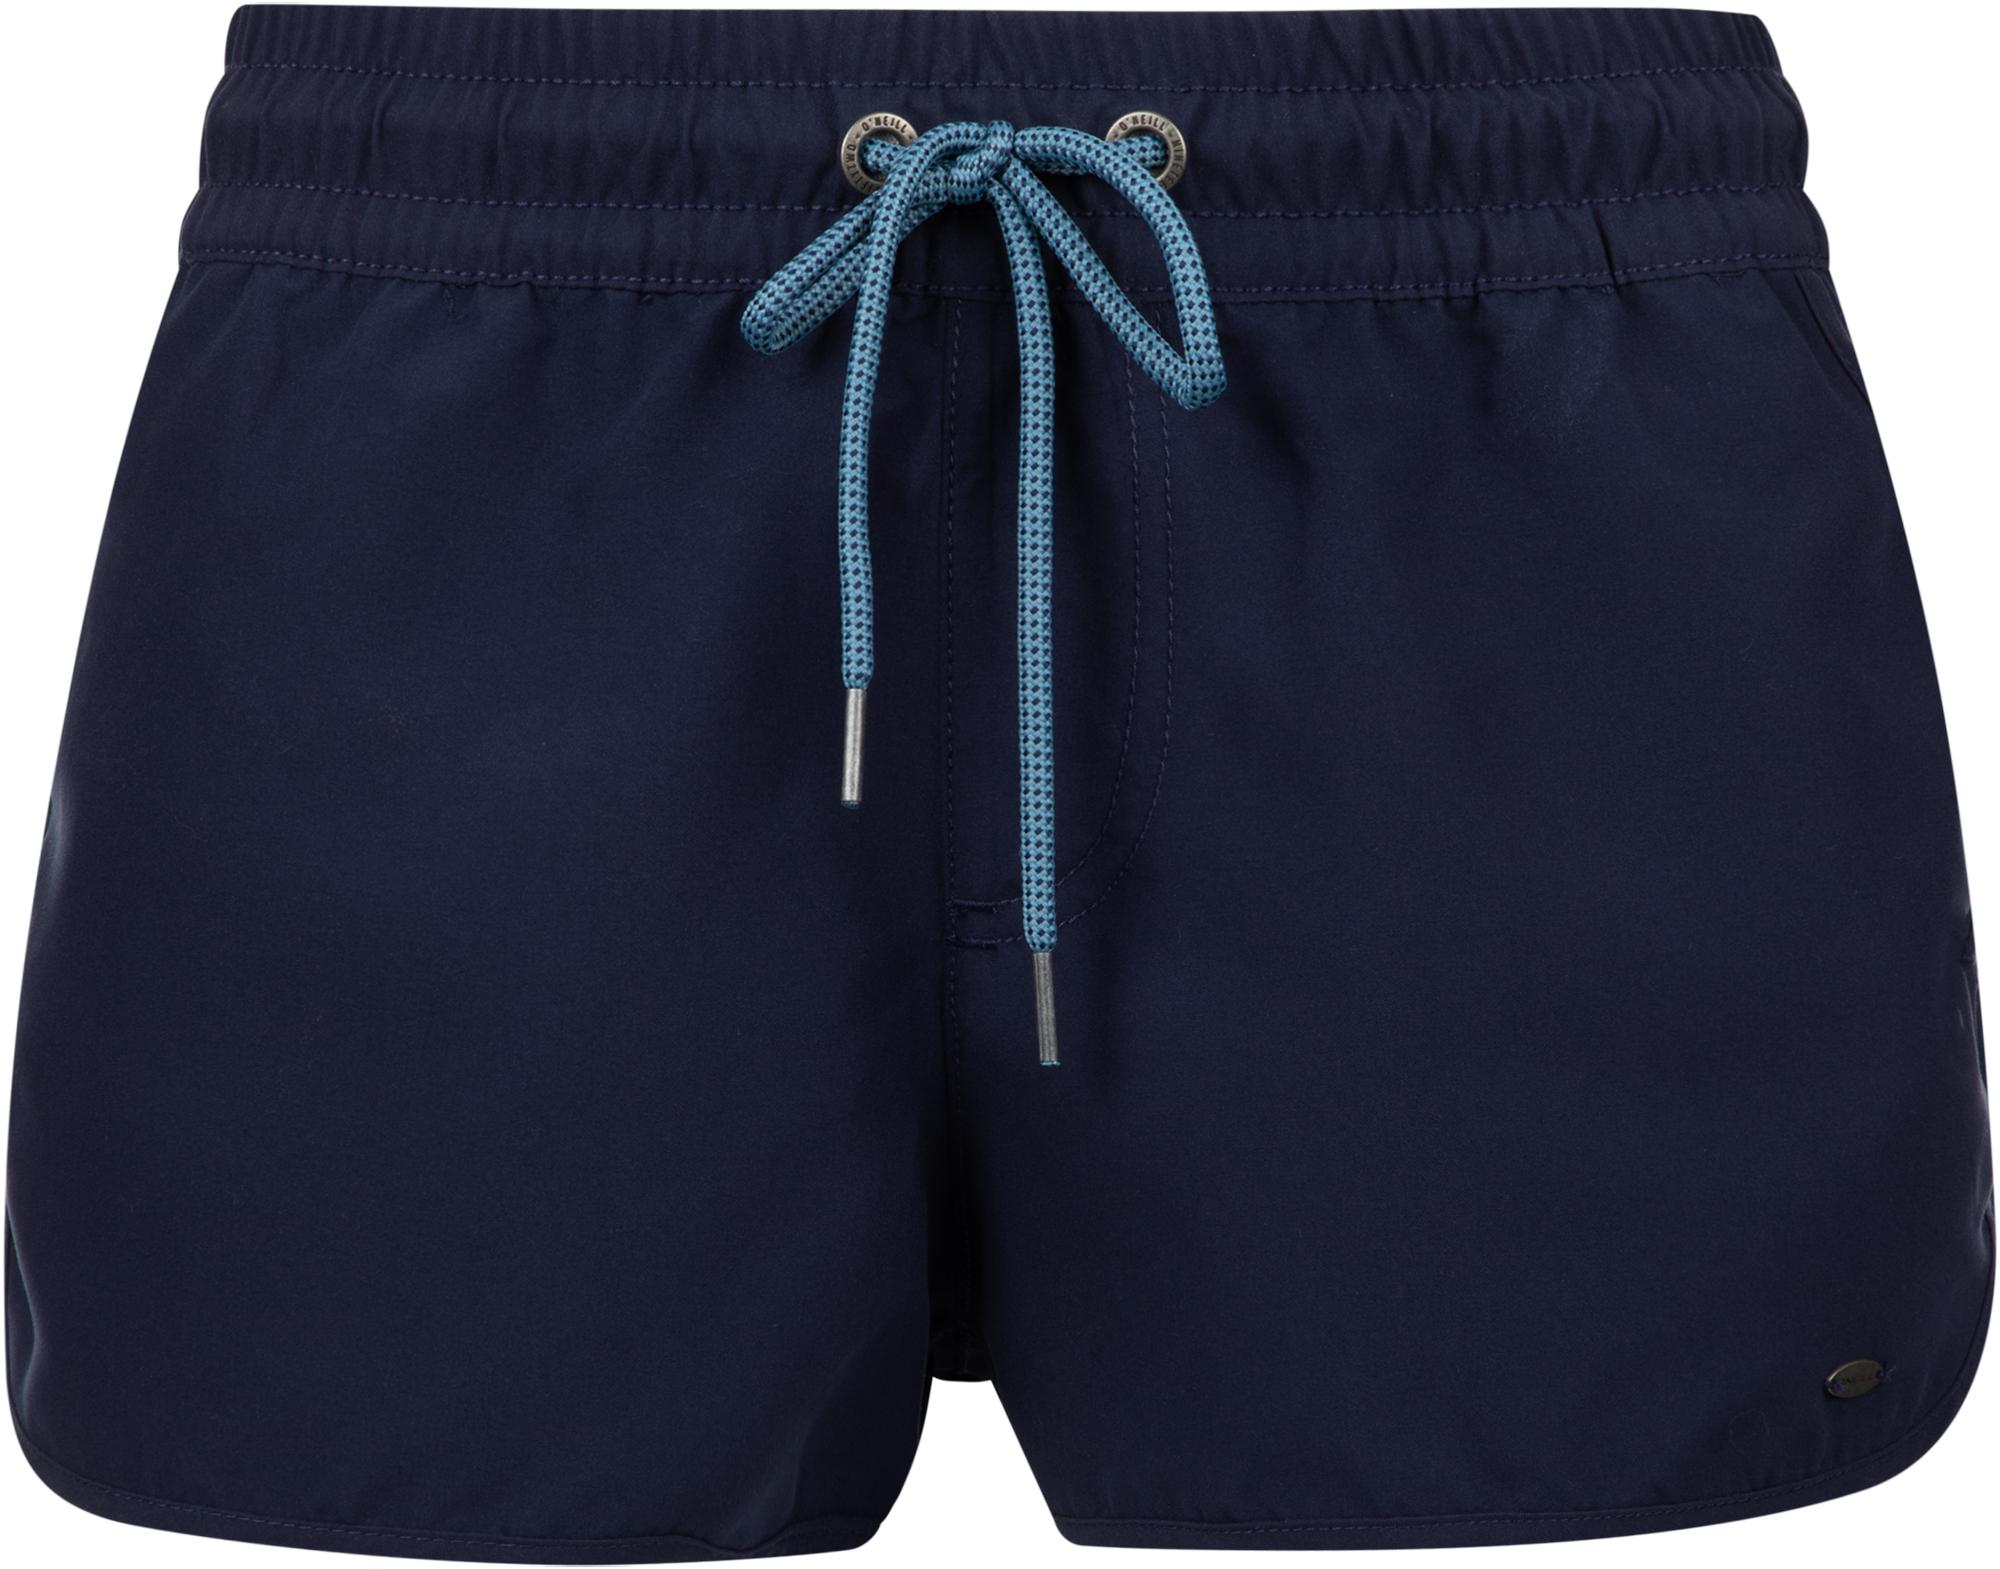 O'Neill Шорты пляжные женские O'Neill Solid, размер 46 o neill шорты пляжные мужские o neill cali размер 54 56